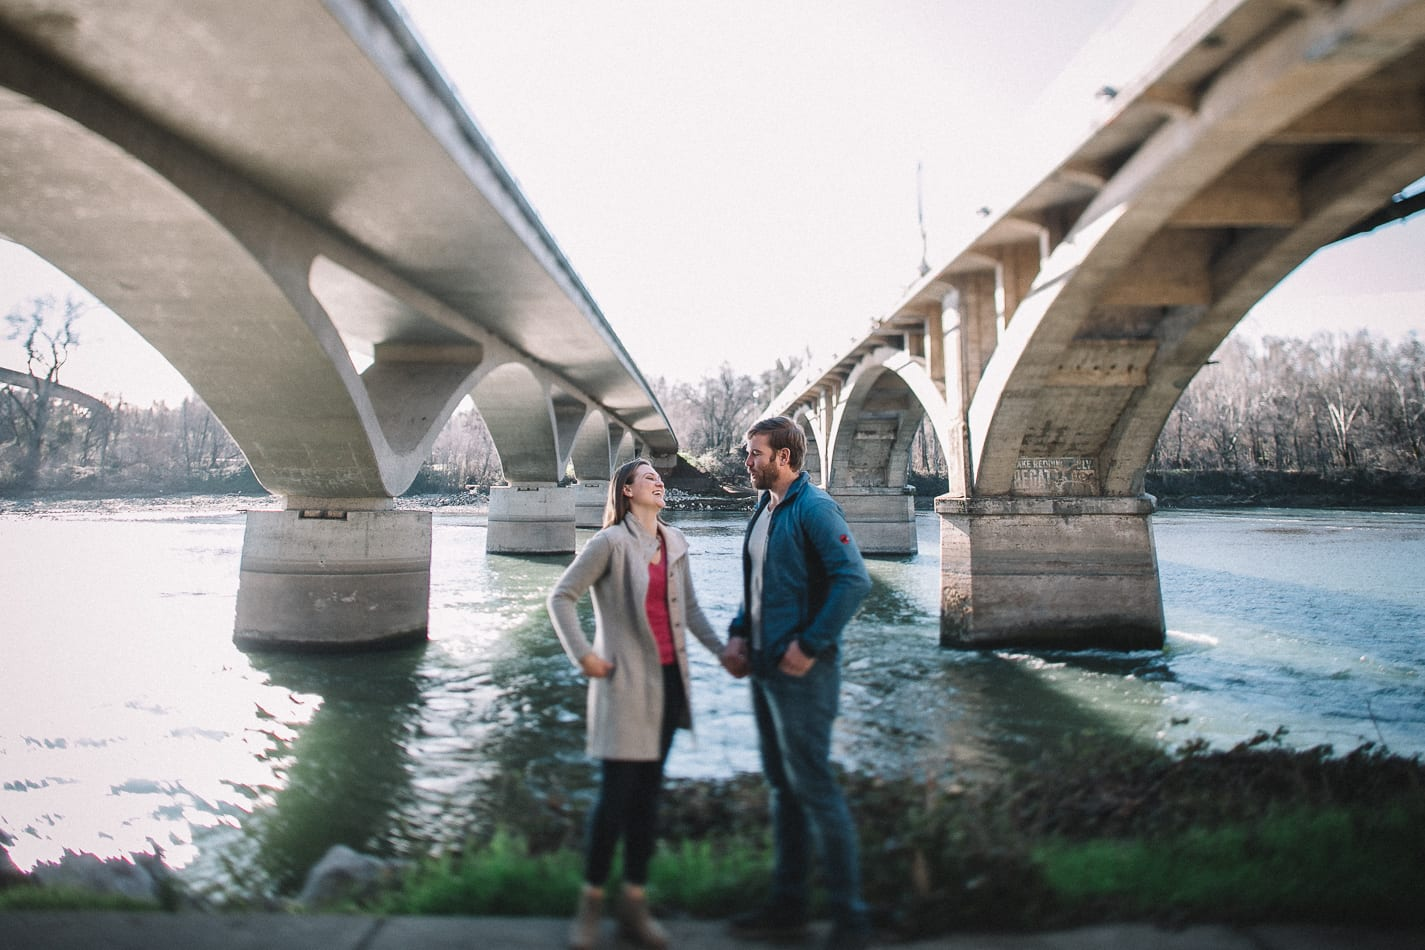 caldwell-park-diesel-horse-bridge-engagement-photo-7